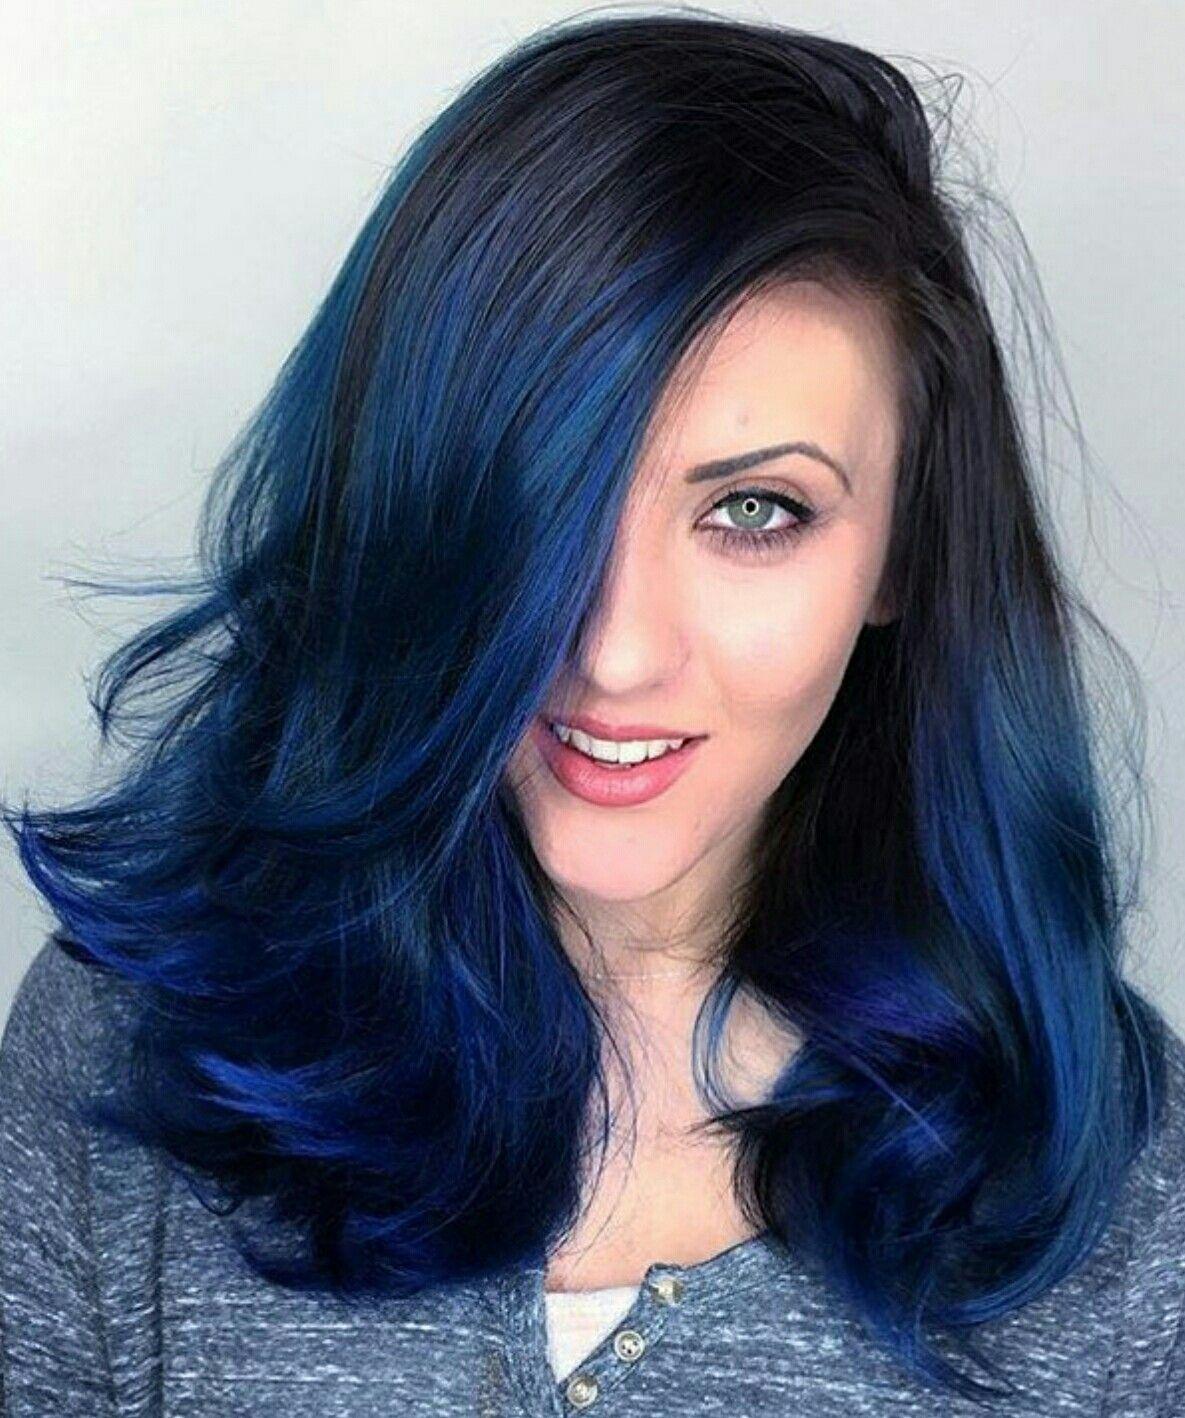 Pin By Rachel Carmona Hughes On Something Fun Hair Color For Black Hair Hair Color Blue Hair Color Dark